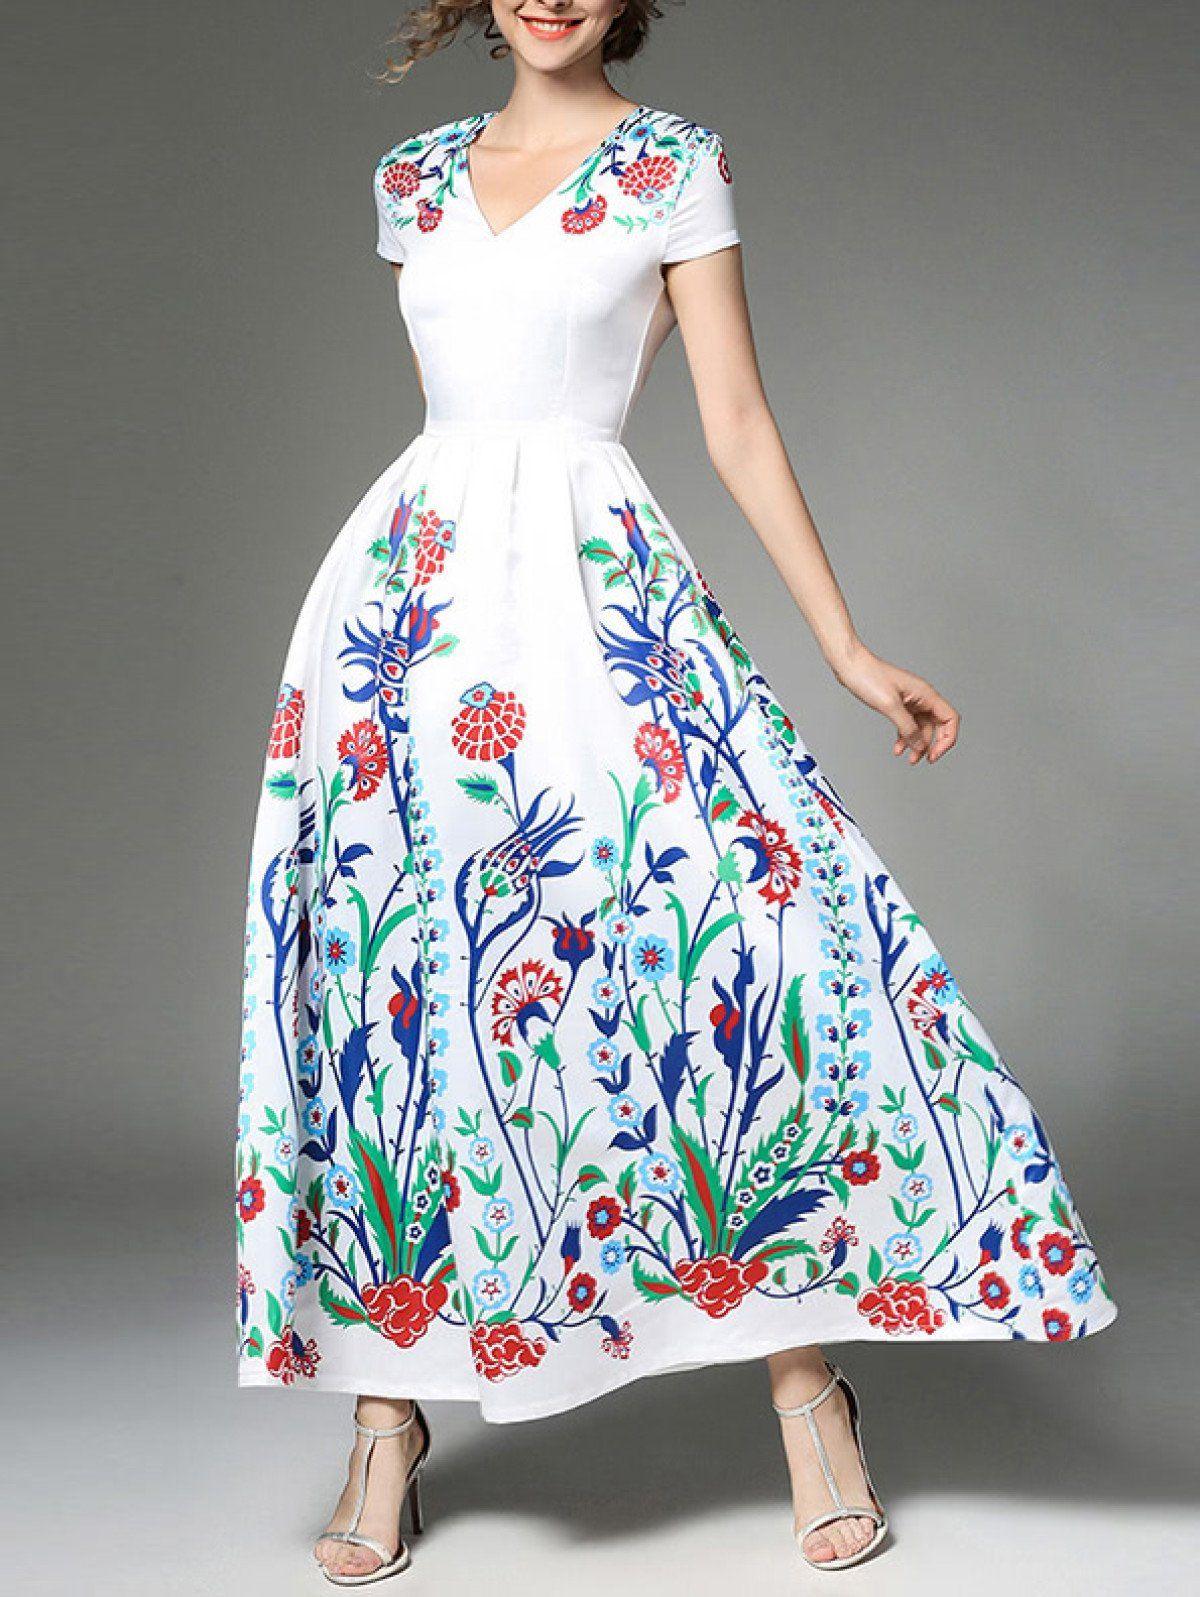 Dresses by borntowear botanical print full length dress dresses